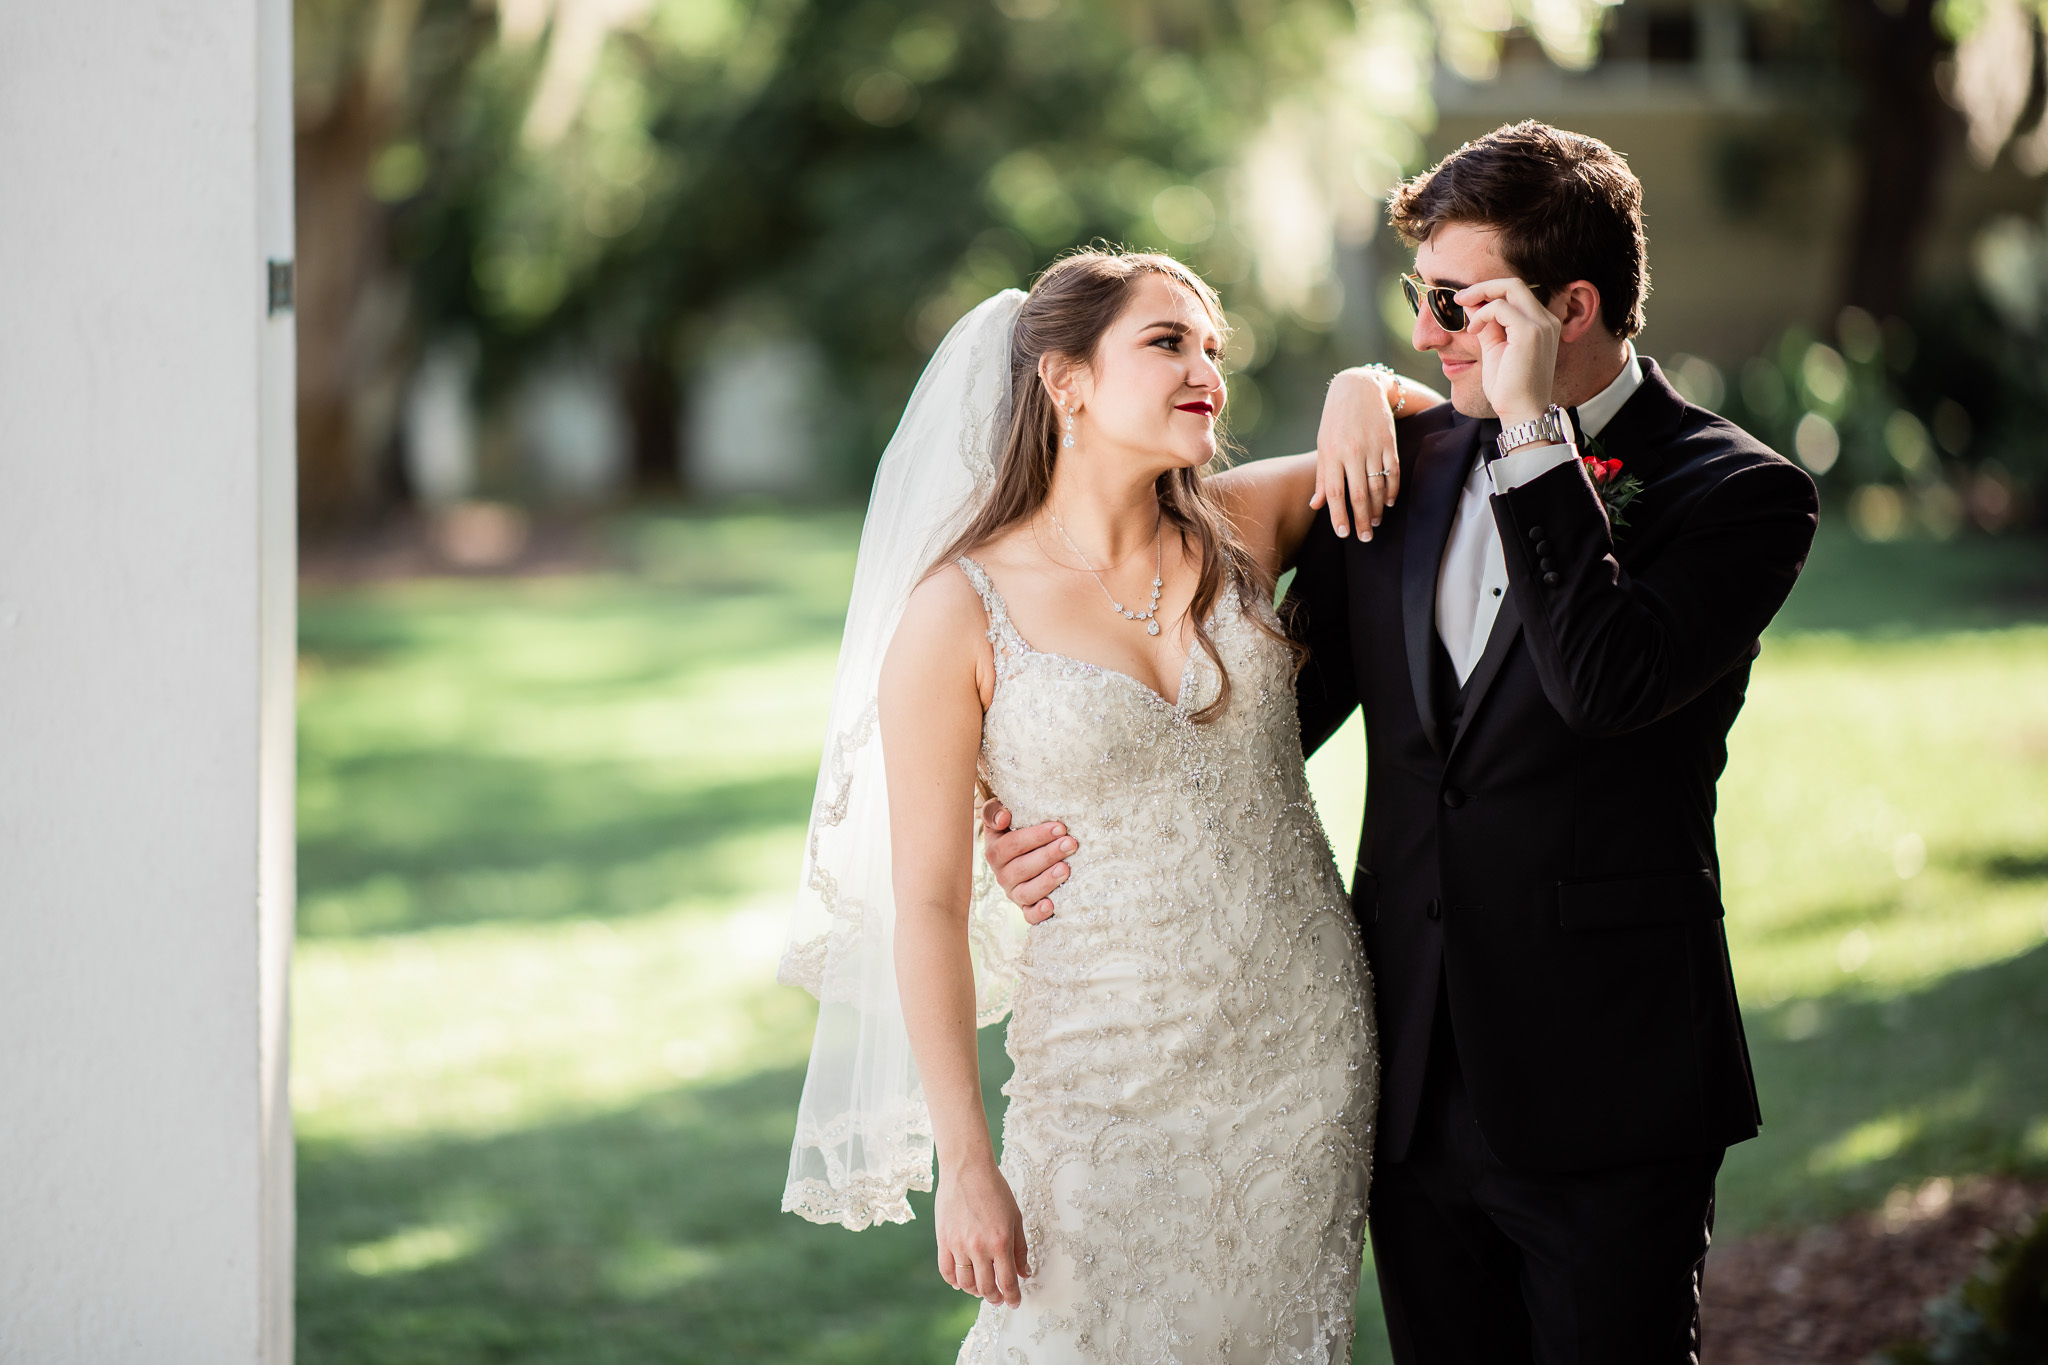 TAMPA_WEDDING_PHOTOGRAPHER_MPMZ_D82_2492_0063.jpg